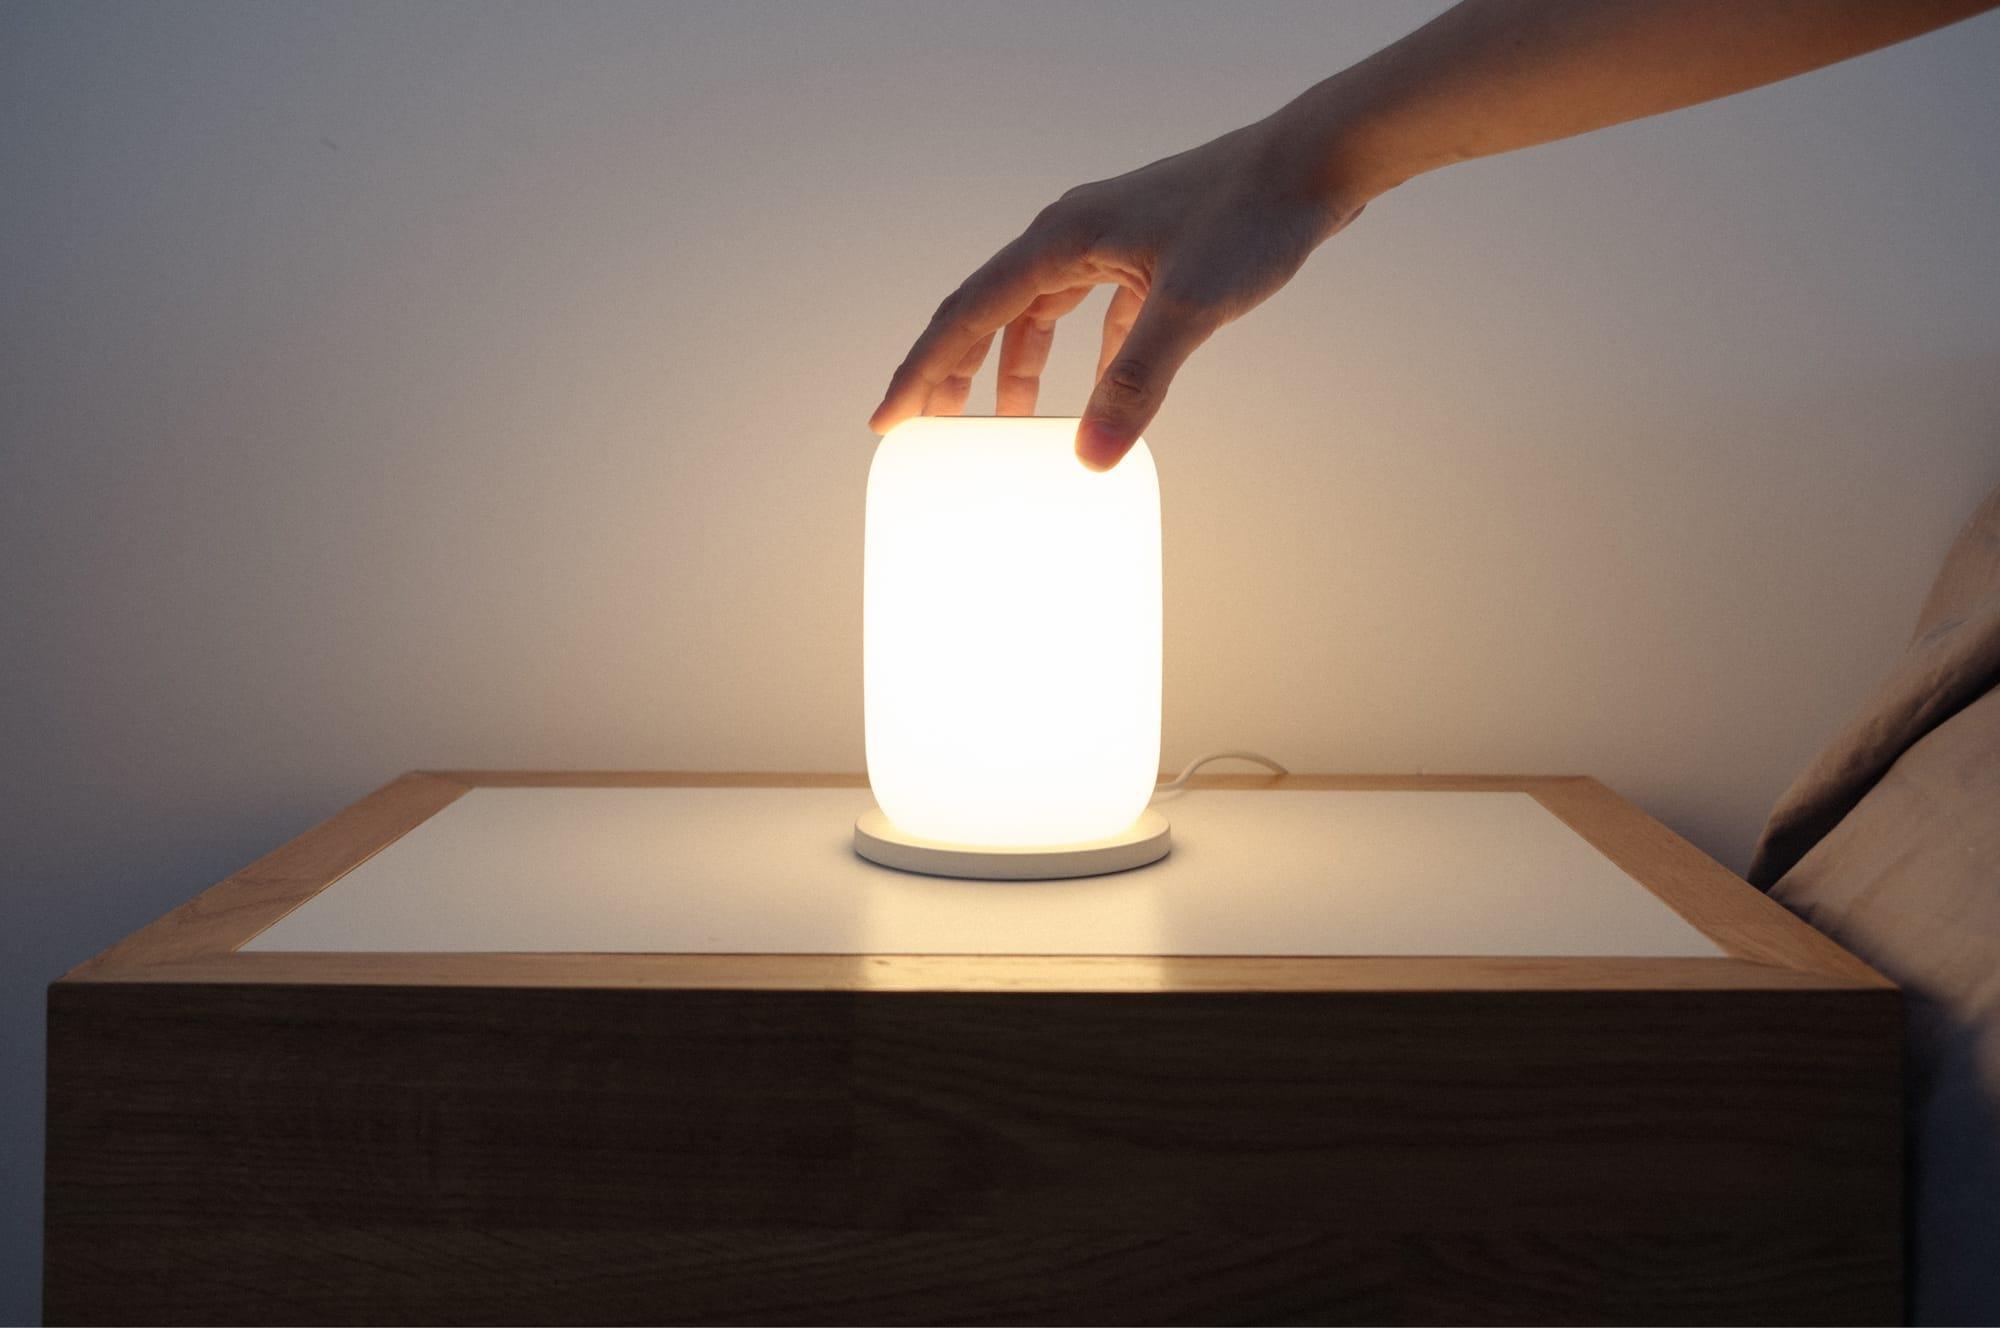 Casper Glow Review - Perfecting gesture controls